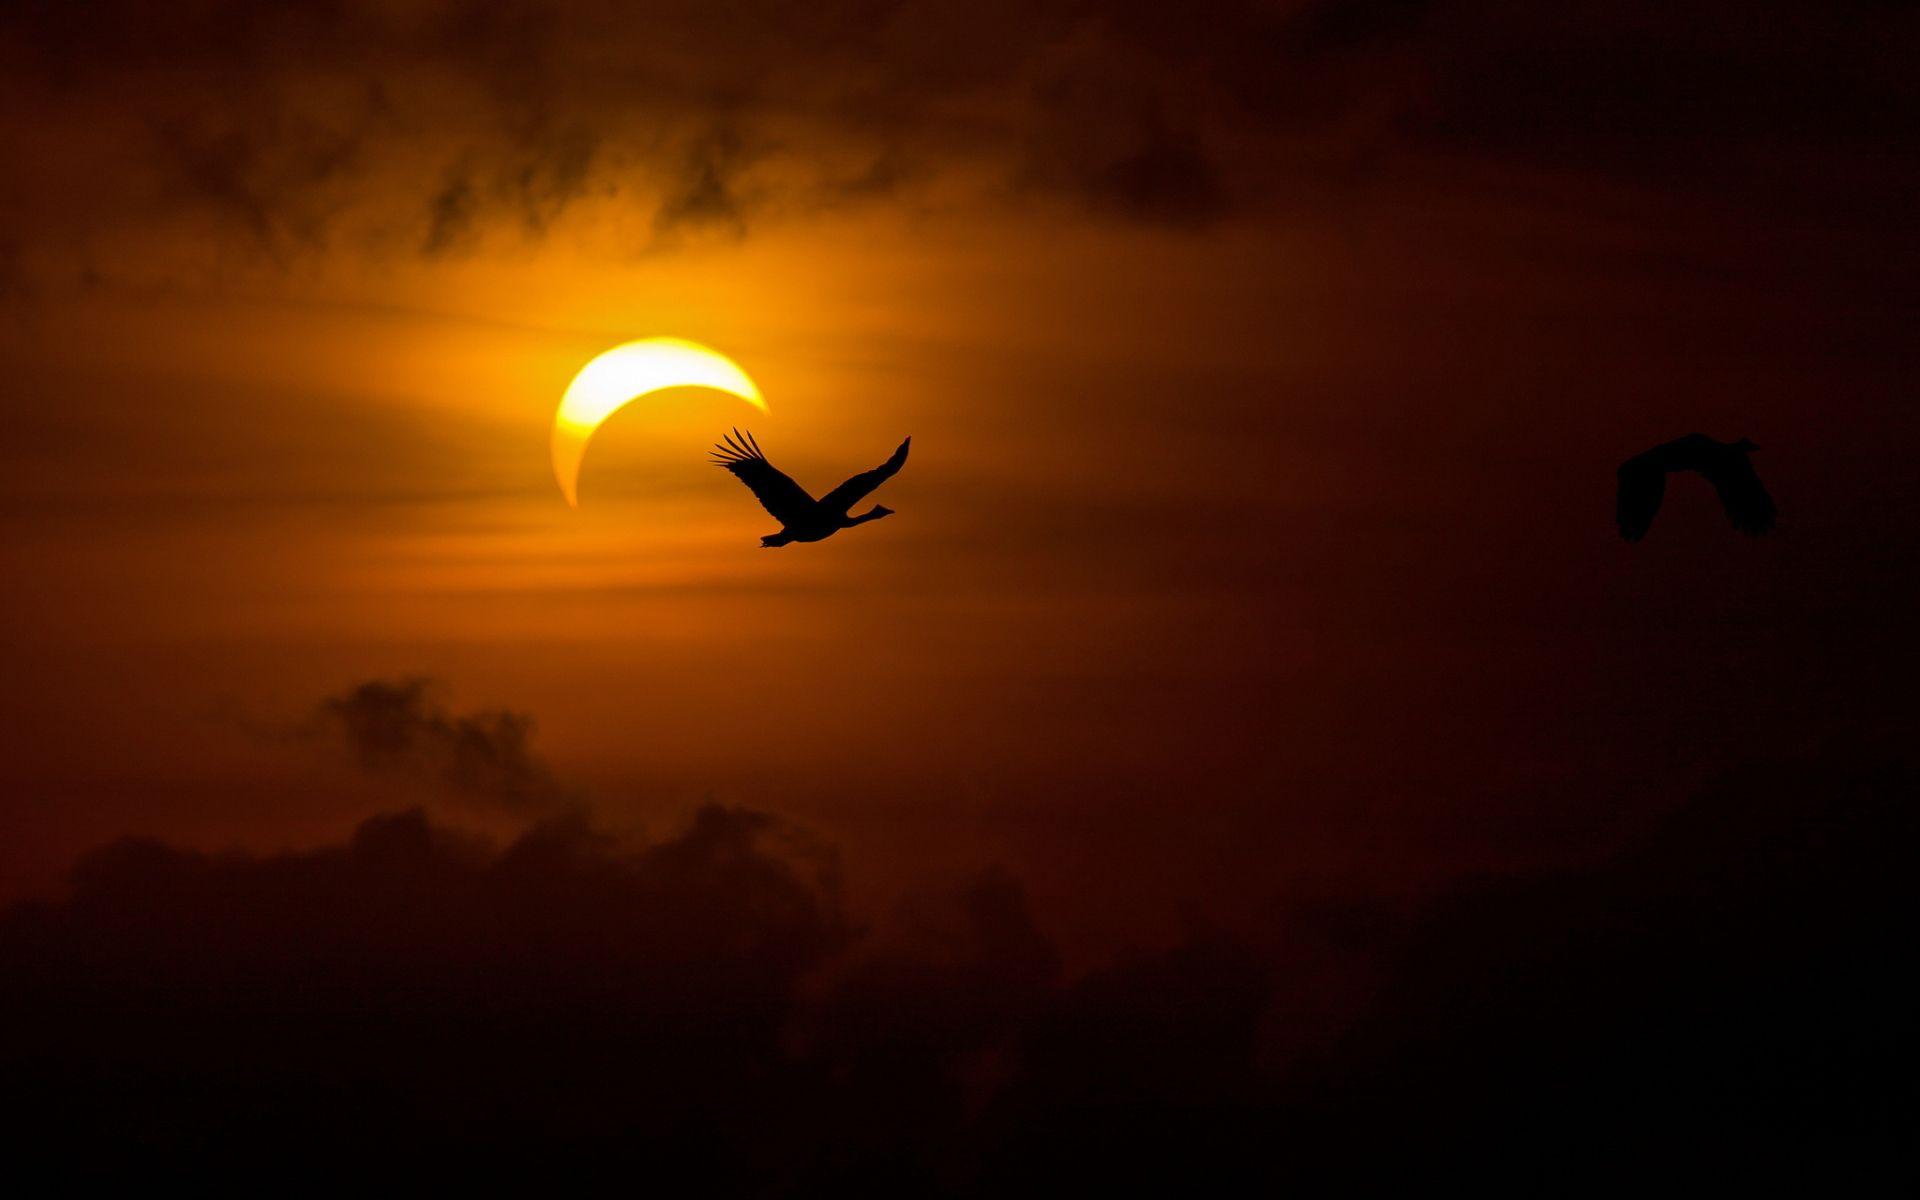 Space solar eclipse iphone plus Wallpaper iPhone Plus 1280×1024 Eclipse  Pictures Wallpapers (48